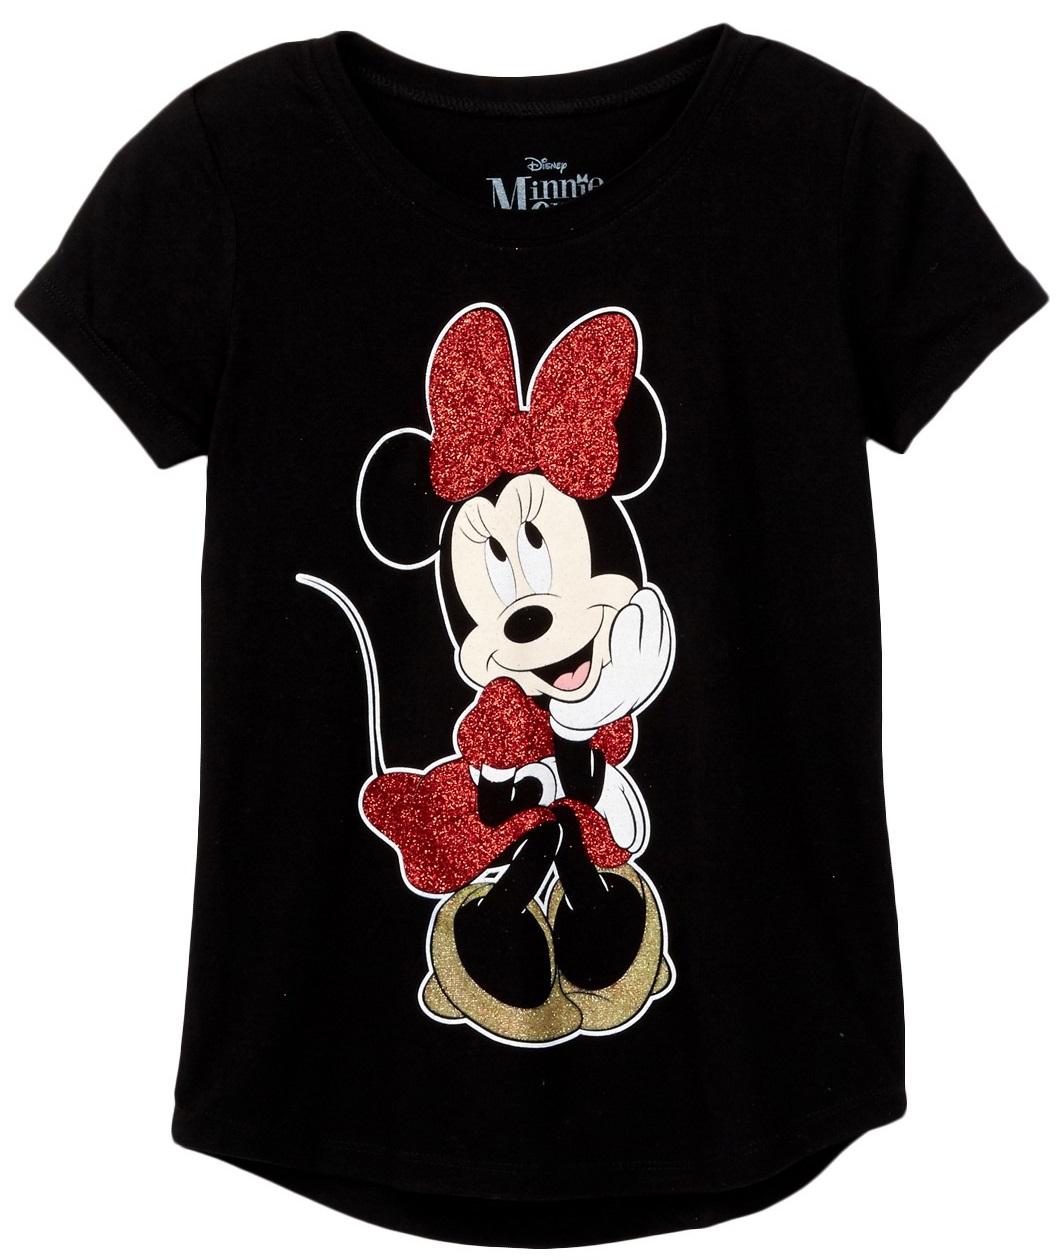 Girls Minnie Mouse Sitting Red Gold Glitter T-Shirt Black